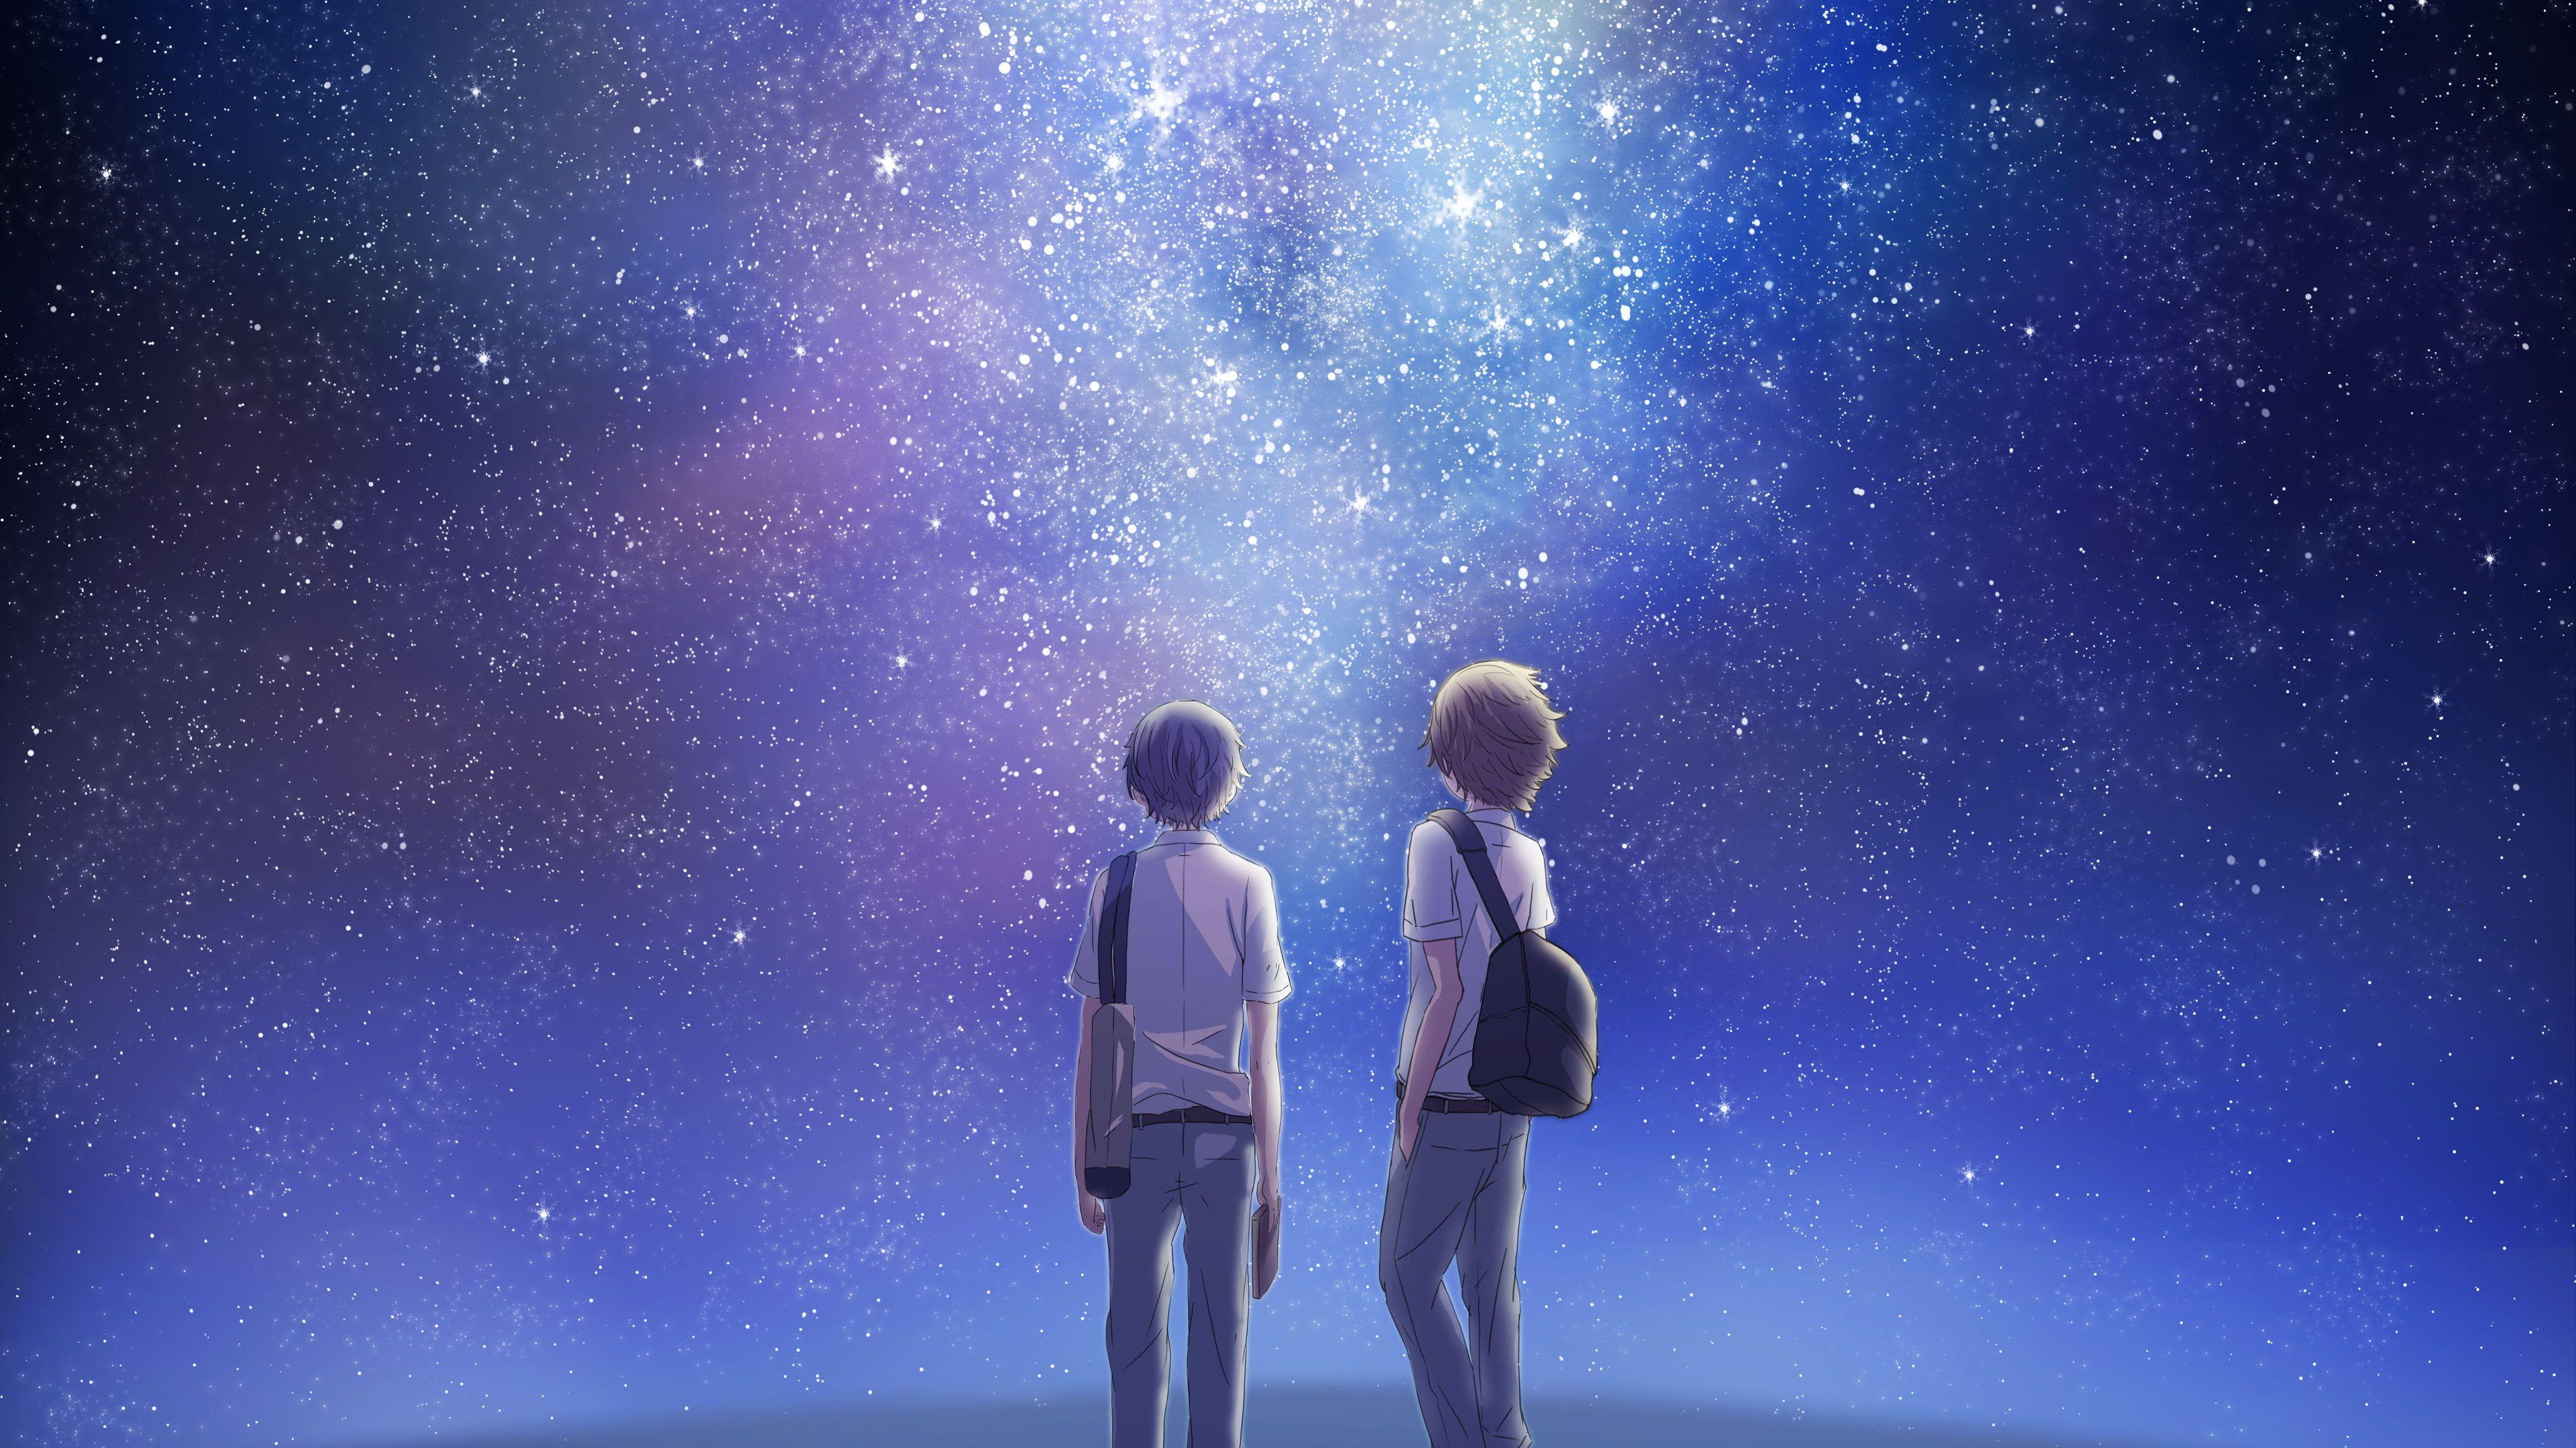 Anime Your Lie In April Kousei Arima Ryota Watari 4k Wallpaper Hdwallpaper Desktop Your Lie In April Hd Wallpaper Anime Aesthetic anime wallpaper your lie in